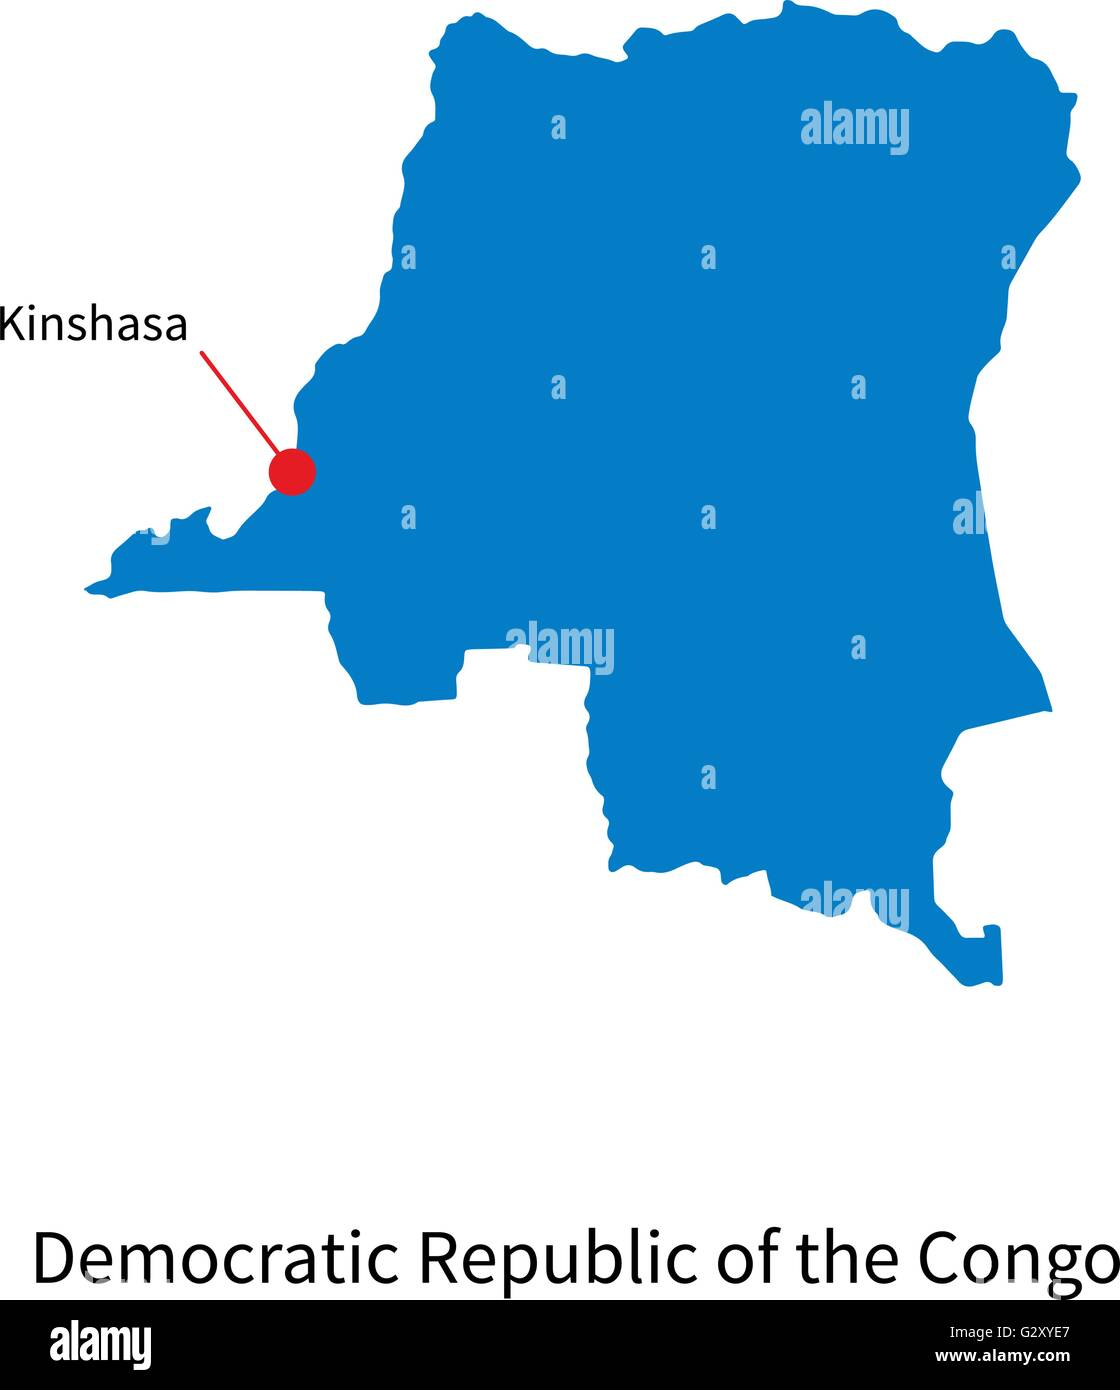 Map Democratic Republic of the Congo and capital city Kinshasa Stock on abidjan map, brazzaville map, dar es salaam, mogadishu map, timbuktu map, kigali map, cape town, africa map, nairobi map, cape town map, praia map, cairo map, yaounde map, congo river, freetown map, luanda map, leopoldville map, kuala lumpur map, maputo map, malabo map, congo map, addis ababa, kampala map, lagos map,